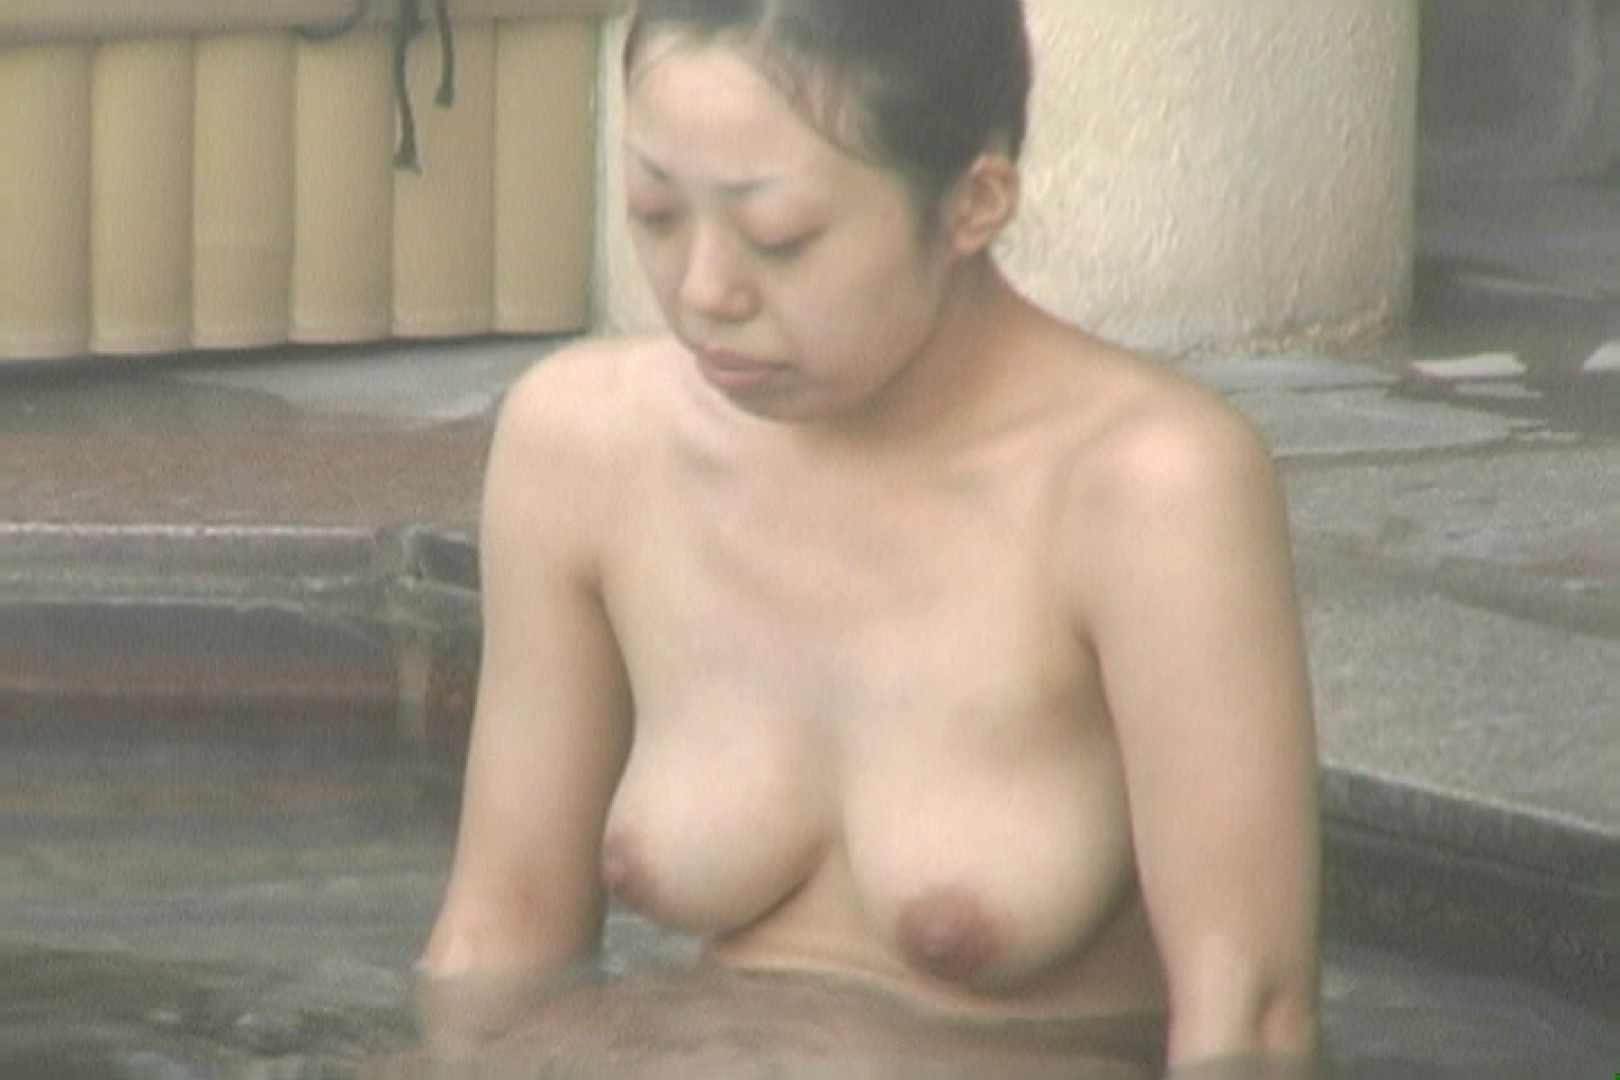 Aquaな露天風呂Vol.626 OLセックス  92画像 33